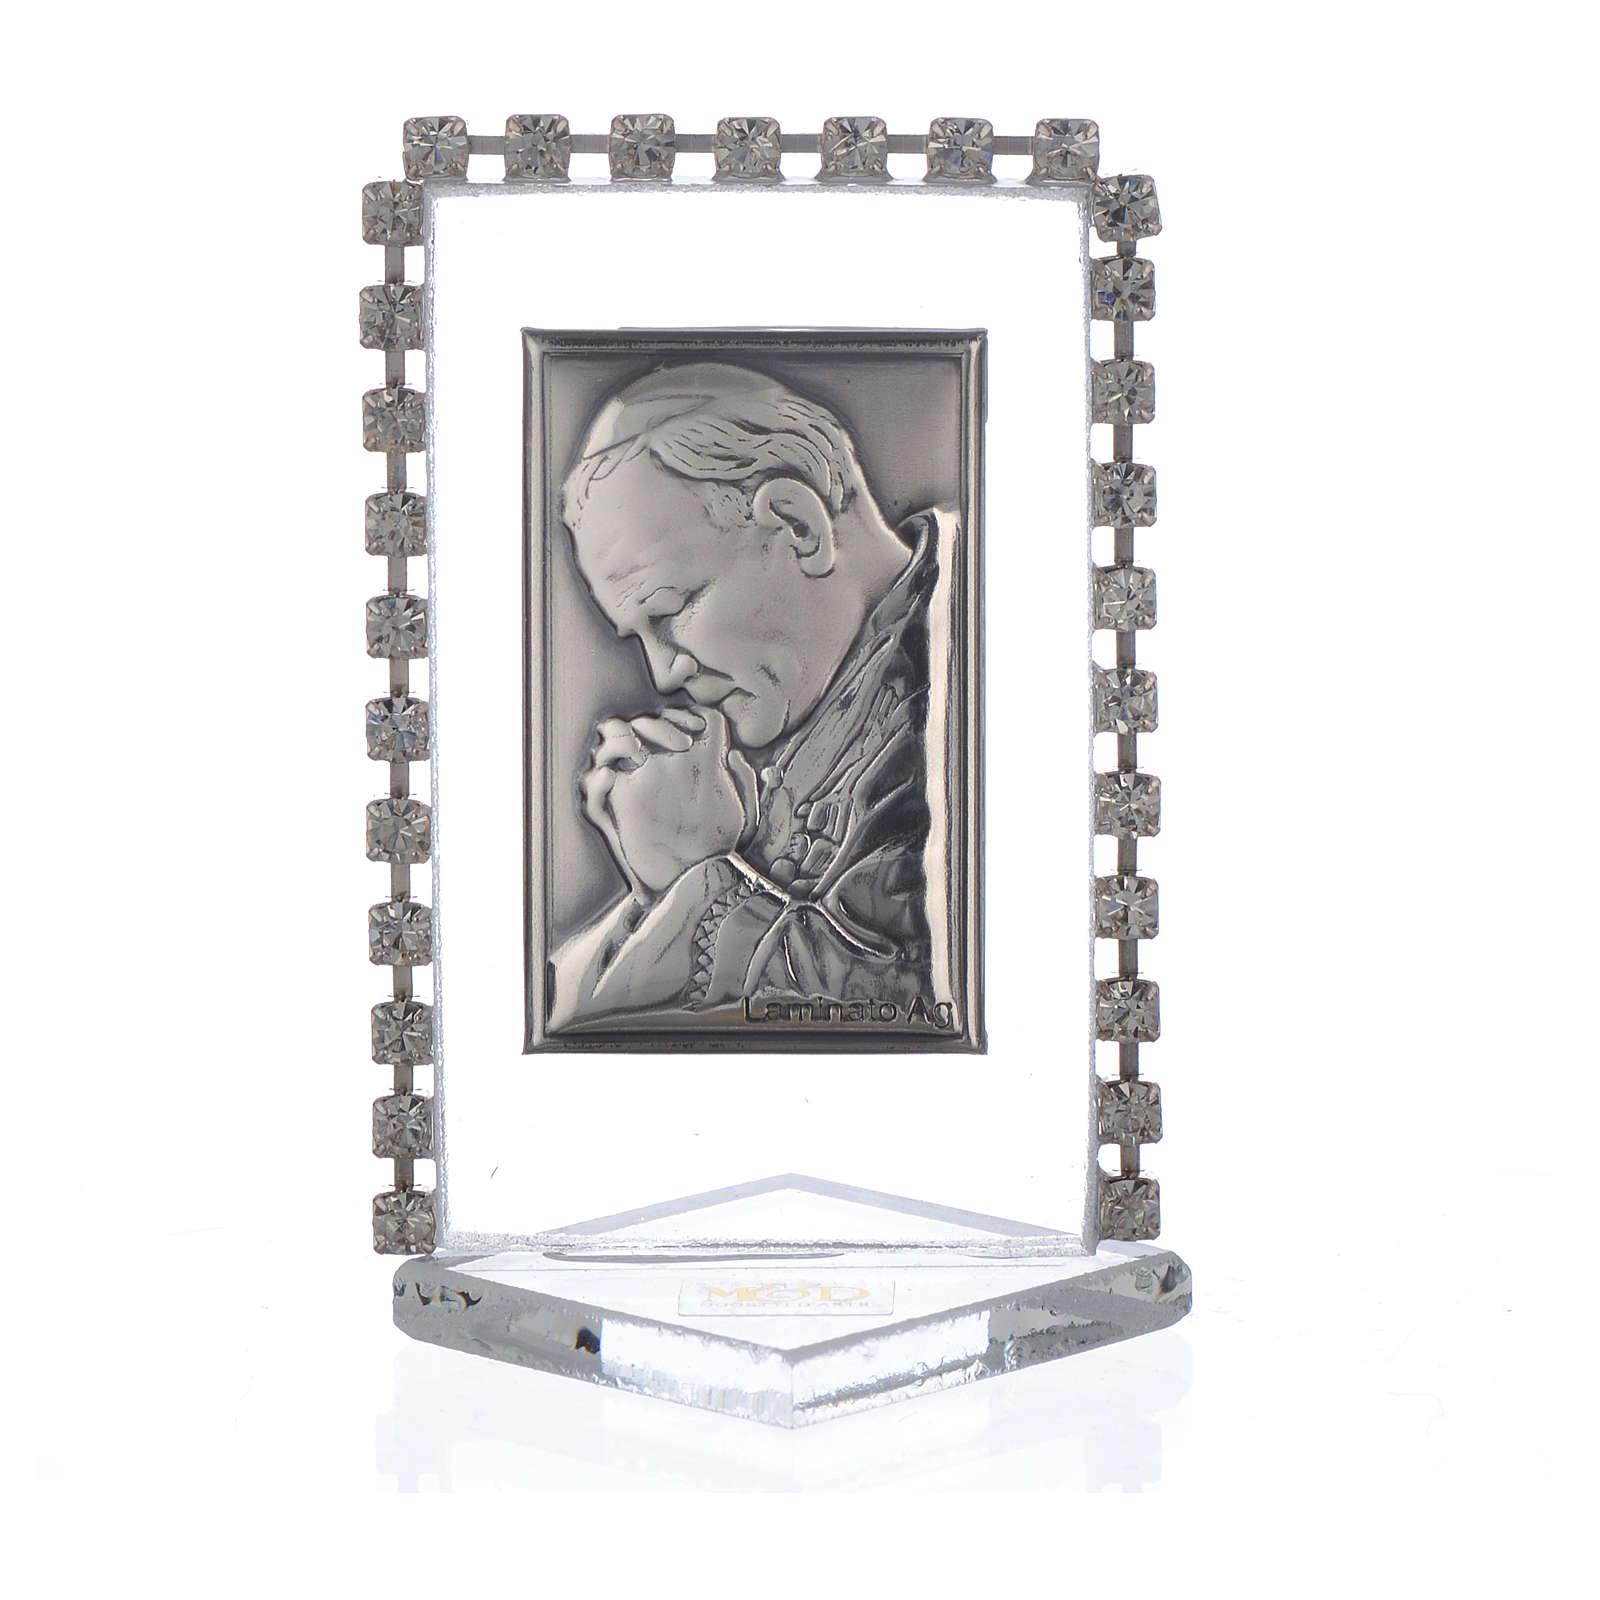 Picture with Pope John Paul II, rhinestones 5.5x3.5cm 3